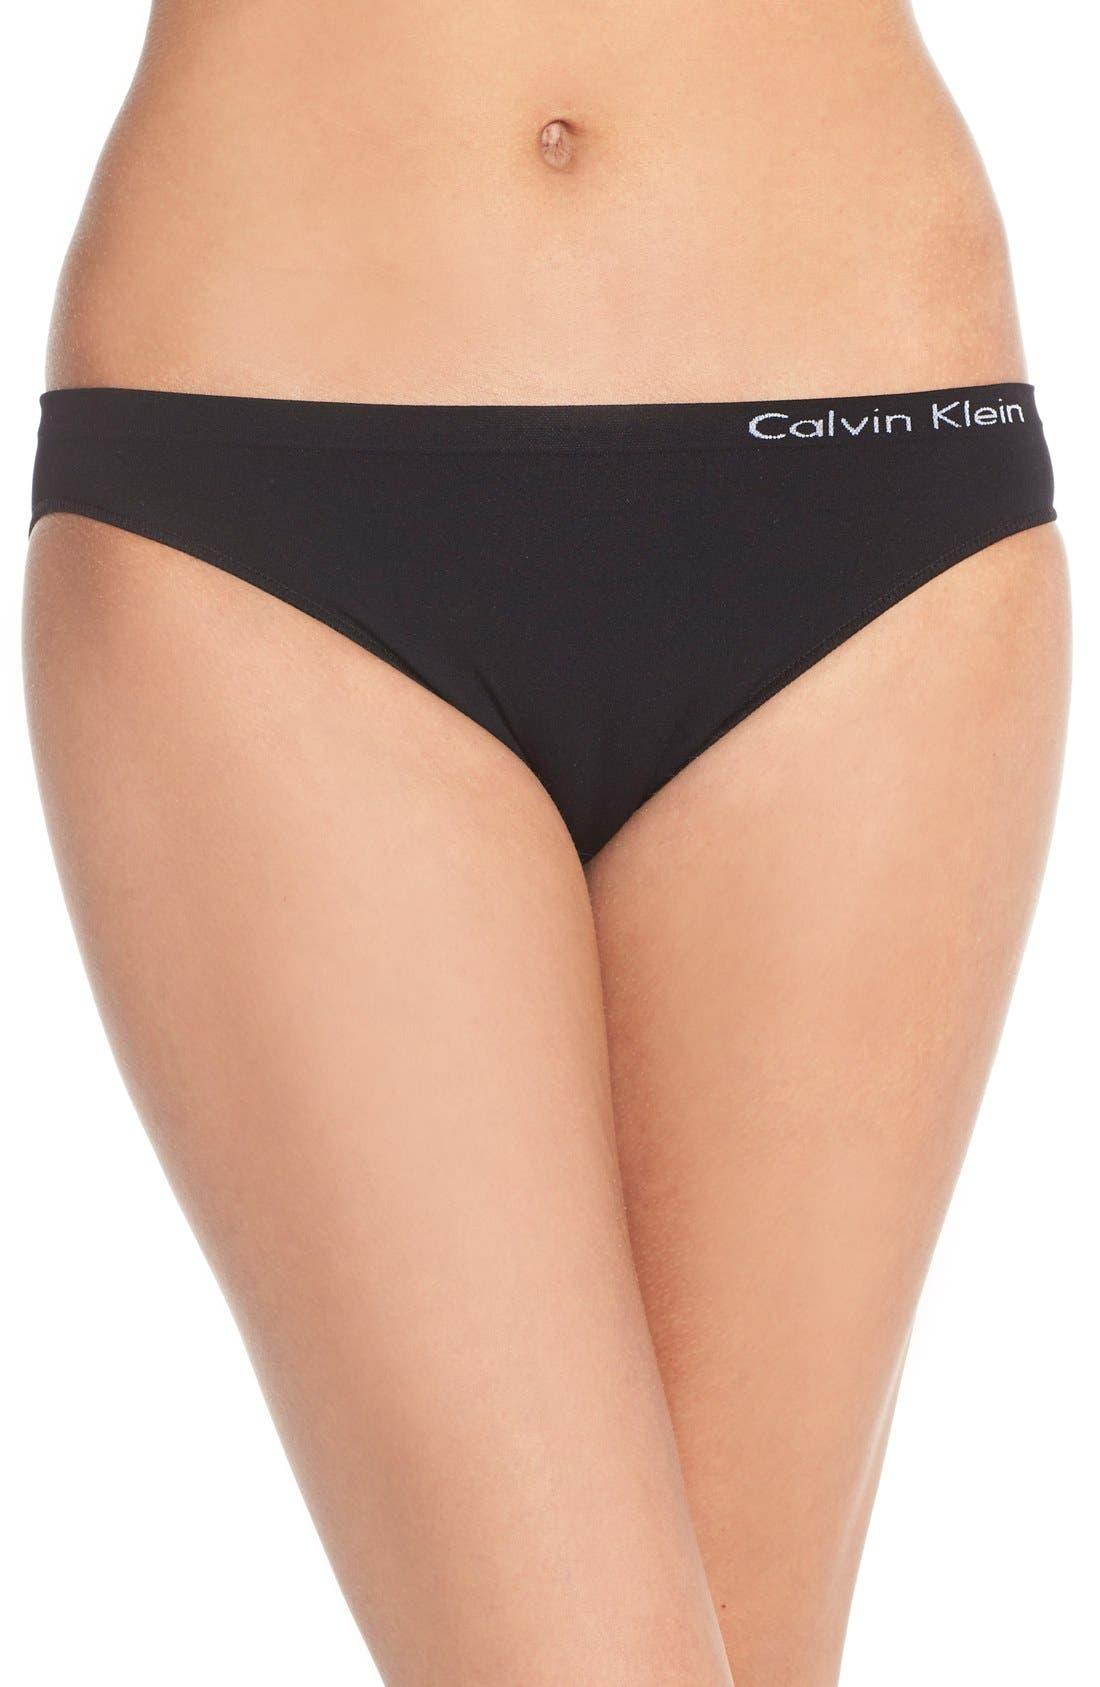 'Pure' Seamless Bikini,                             Main thumbnail 1, color,                             BLACK